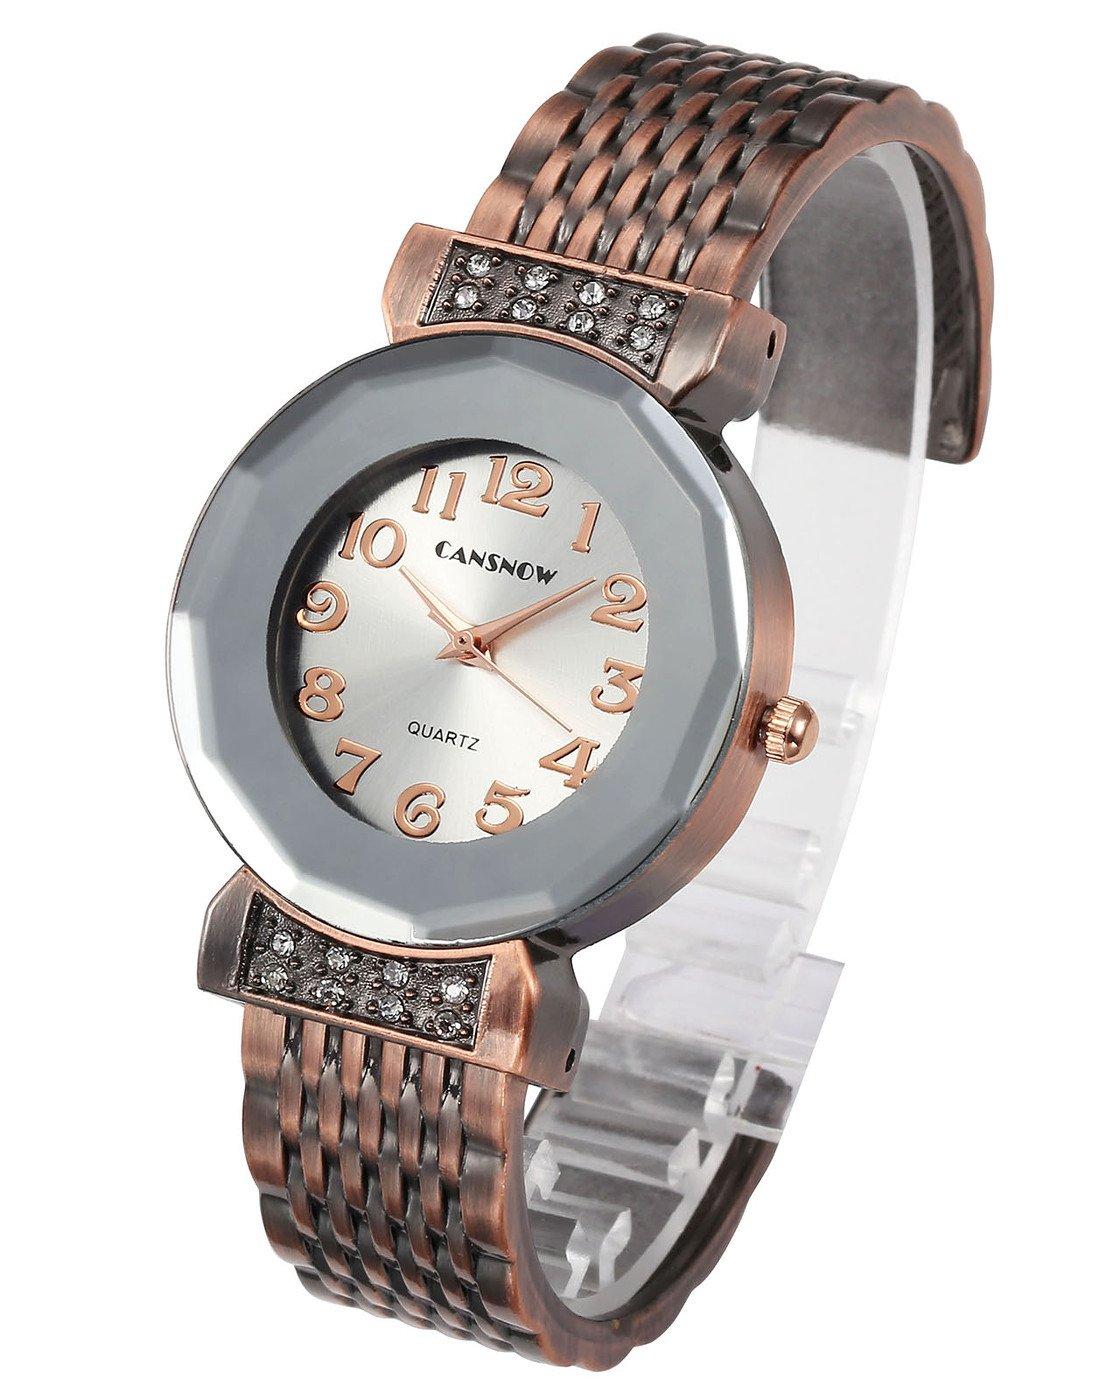 Top Plaza Women Ladies Casual Luxury Gold Bronze Tone Alloy Analog Quartz Bracelet Watch Multilateral Rhombus Dial Rhinestones Decorated Elegant Dress Bangle Cuff Wristwatch-Bronze #1